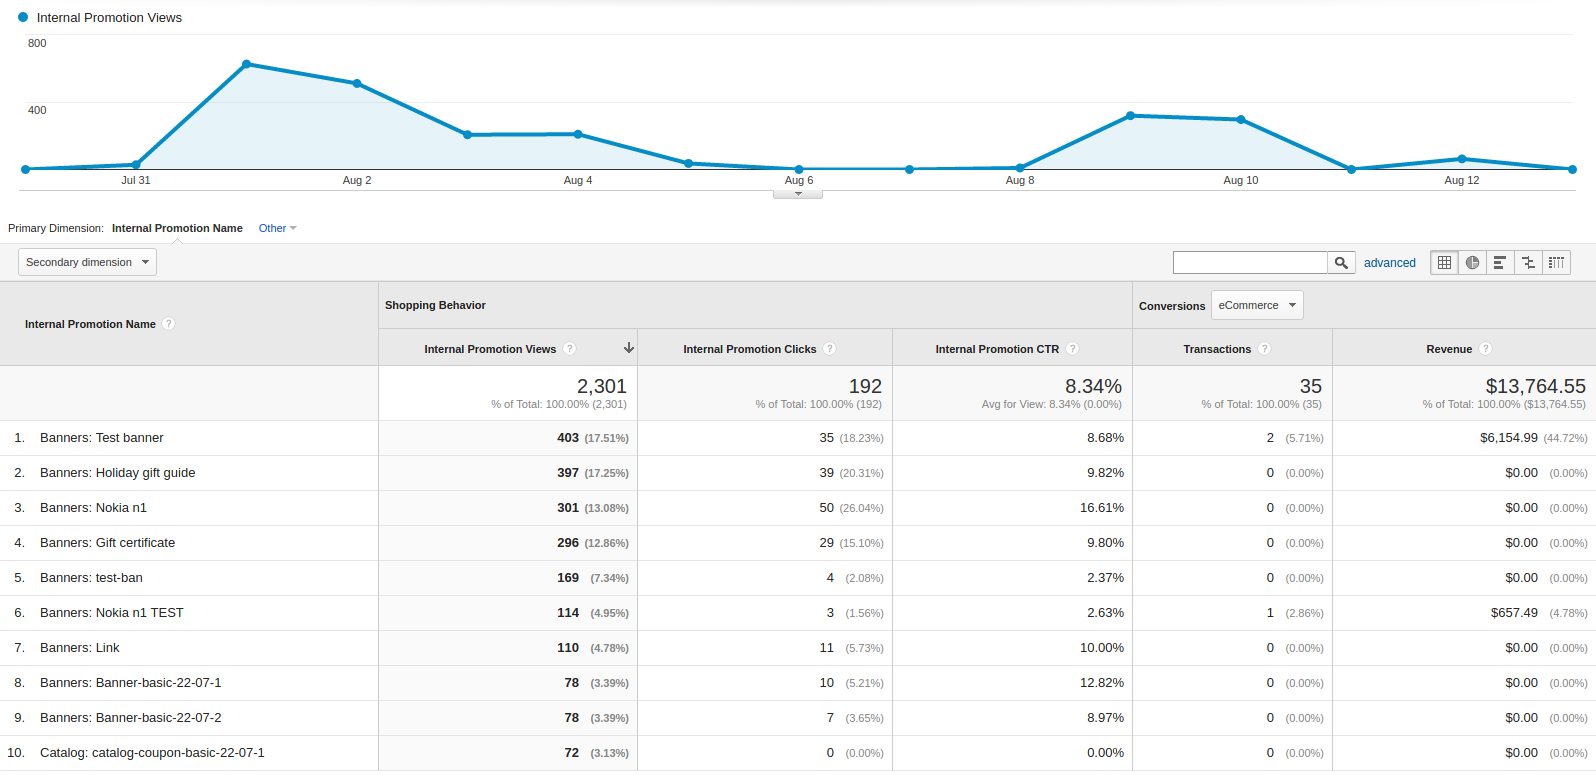 Google Analytics Enhanced Ecommerce Statistics